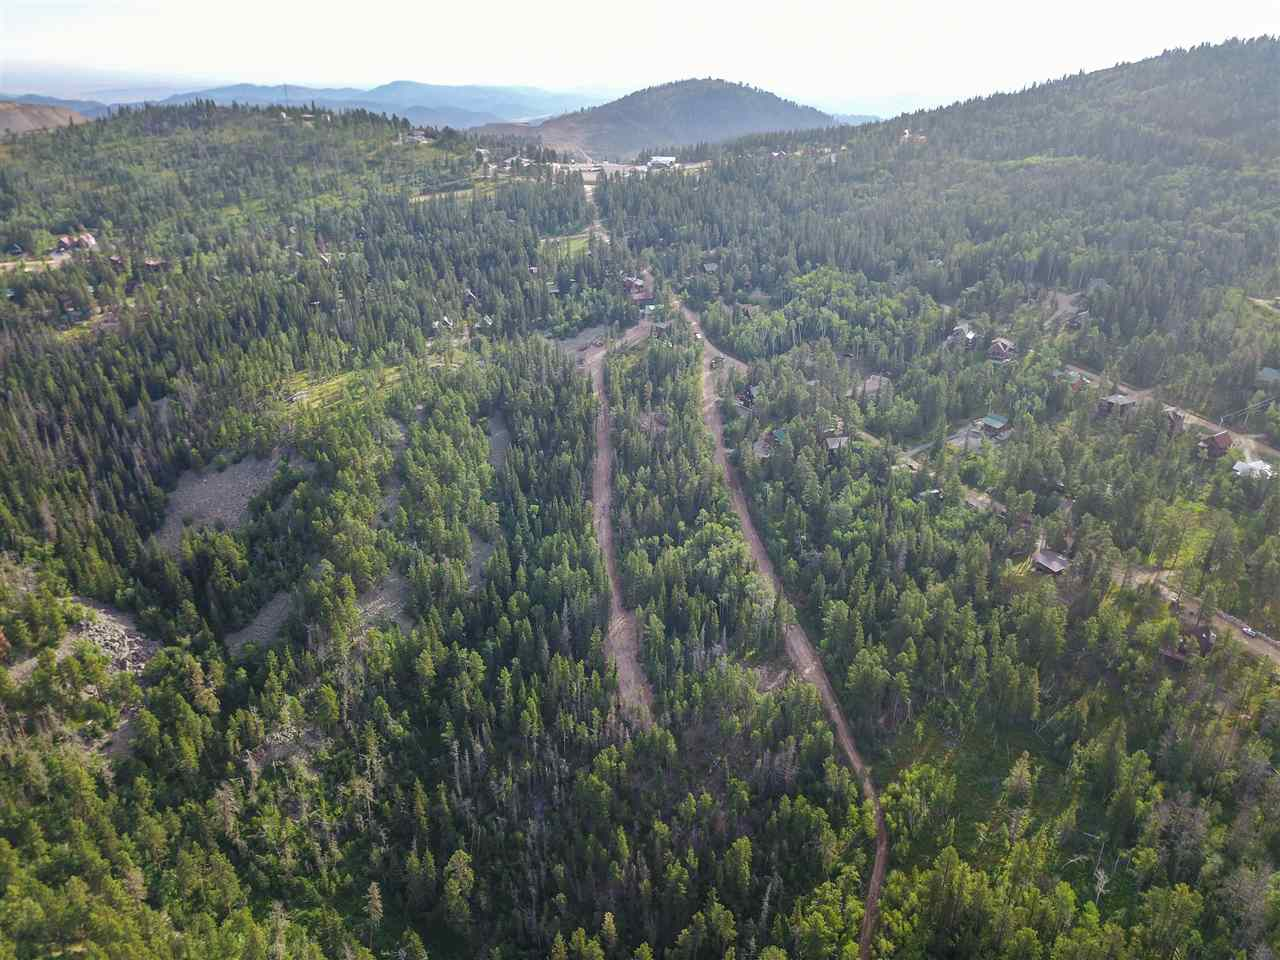 TBD 20 Lost Camp Trail